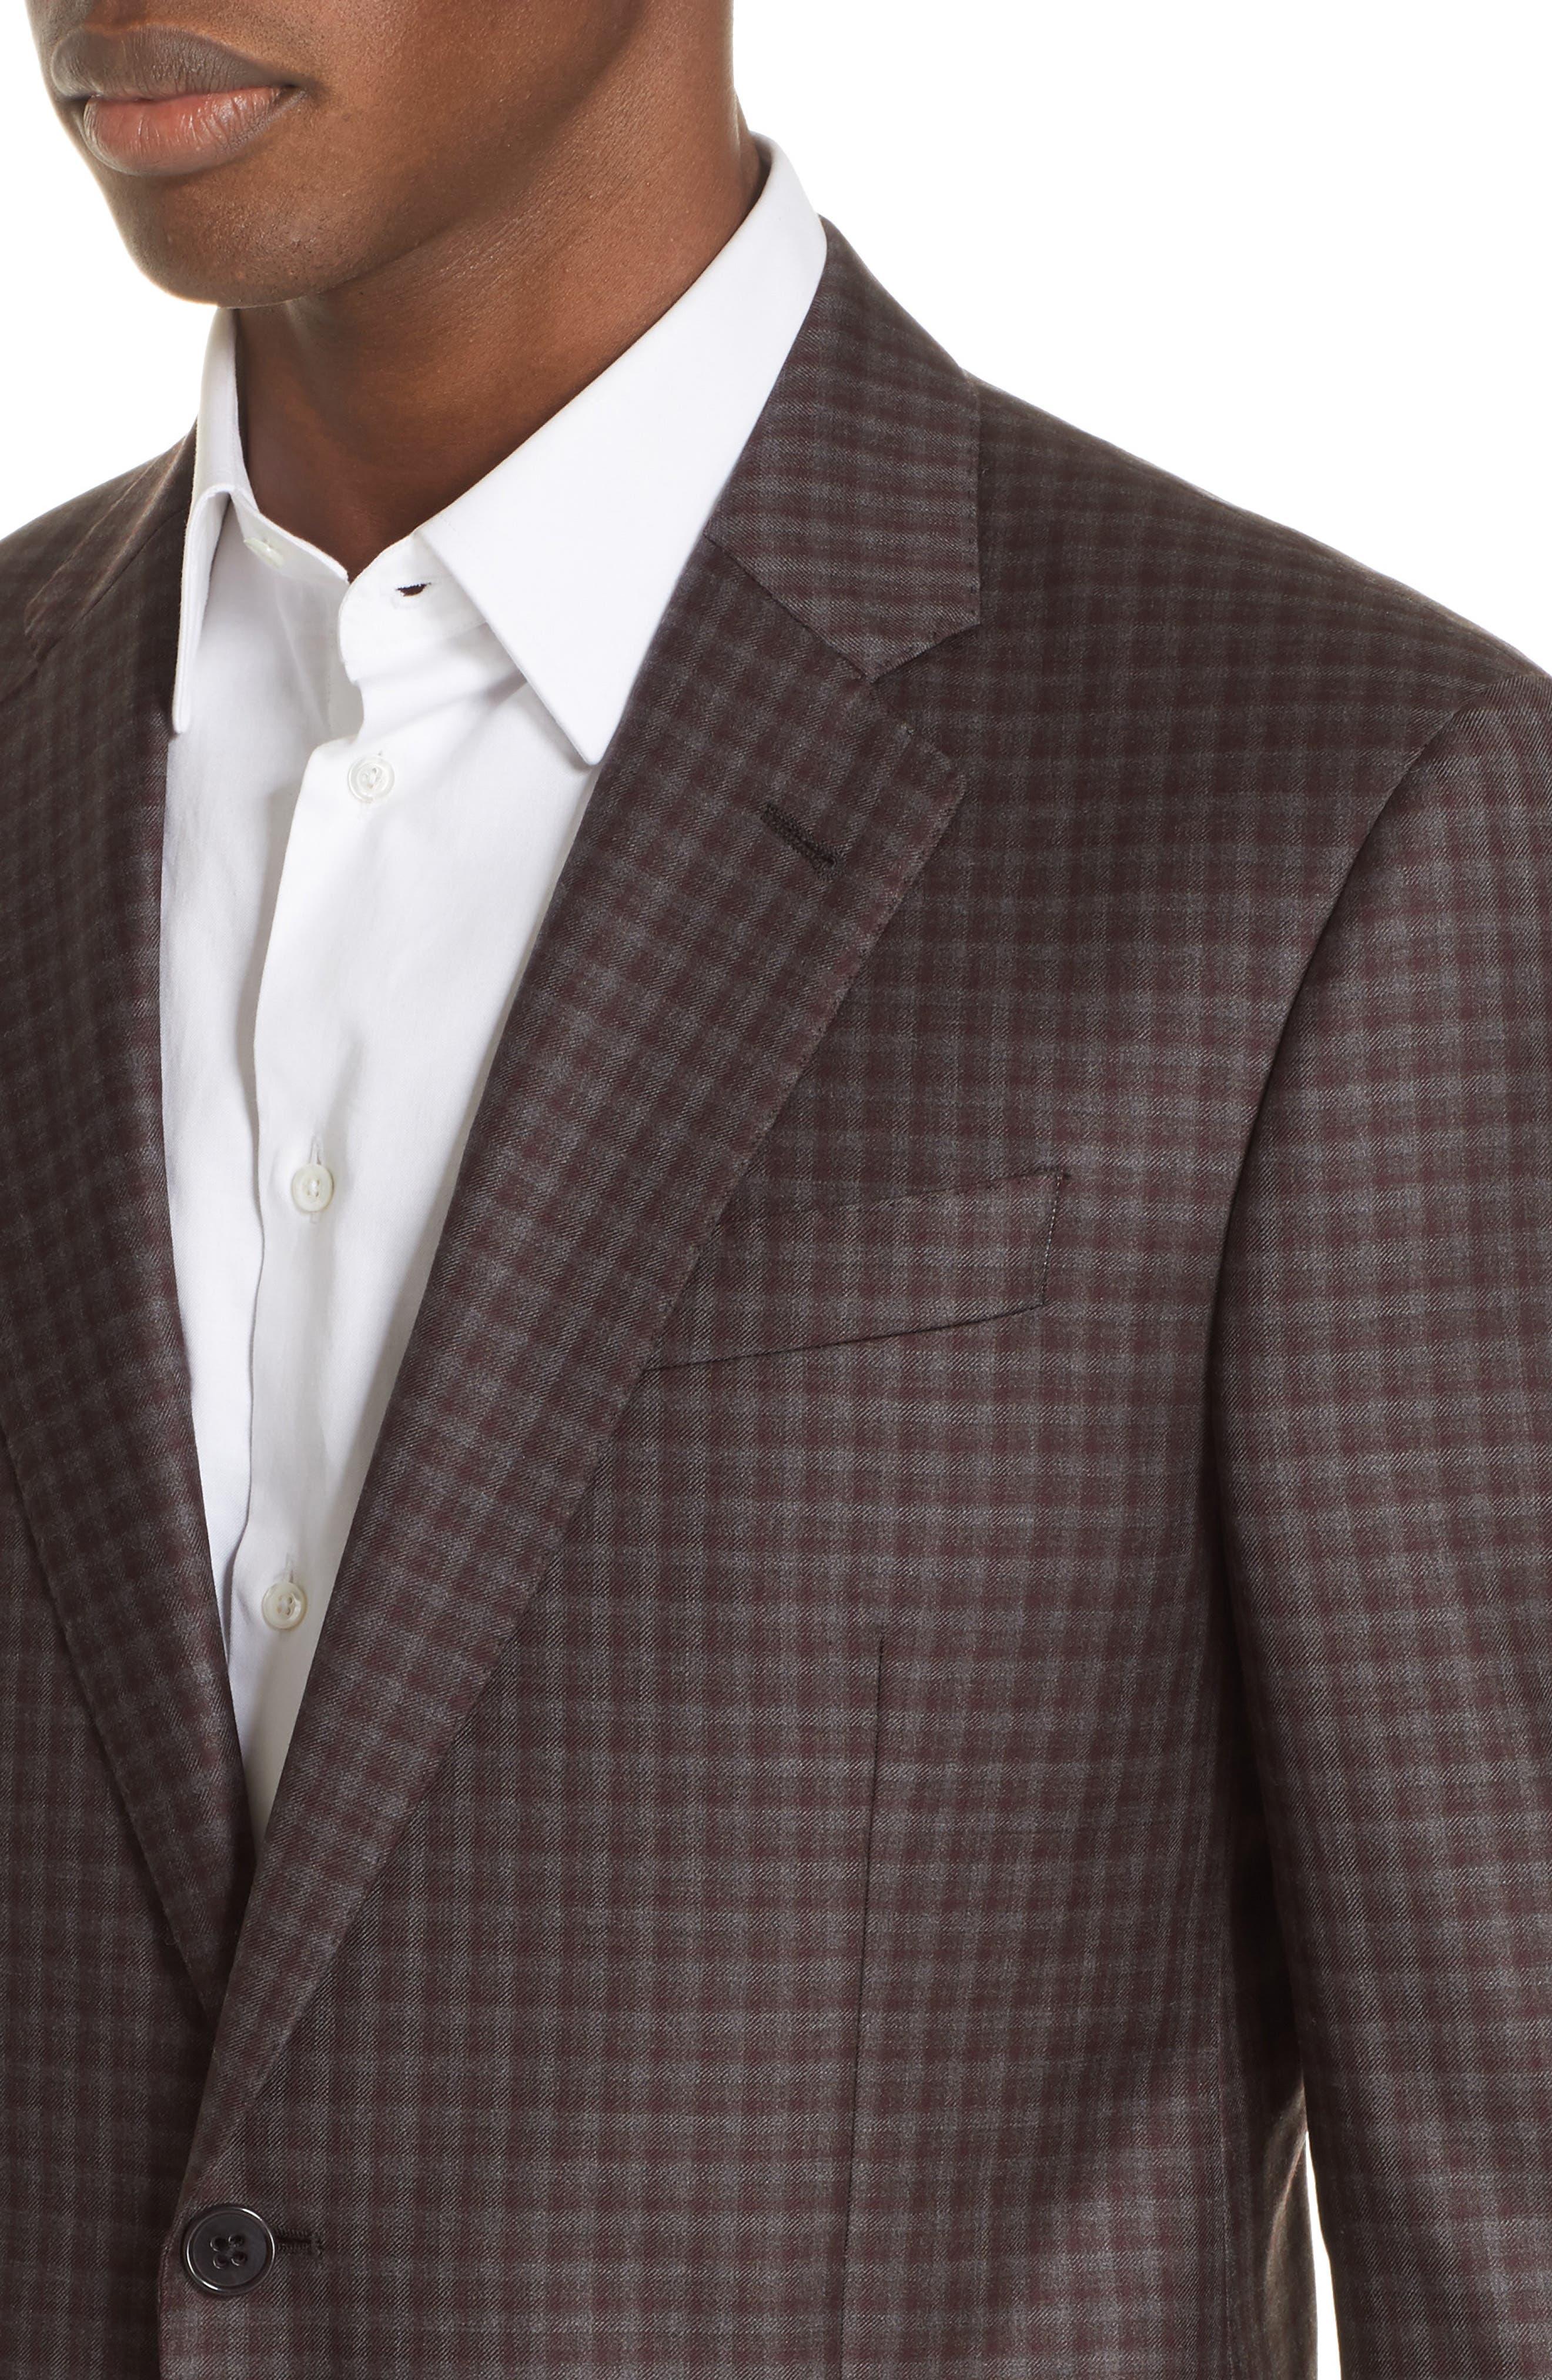 G-Line Trim Fit Plaid Wool Sport Coat,                             Alternate thumbnail 4, color,                             RED/ BROWN